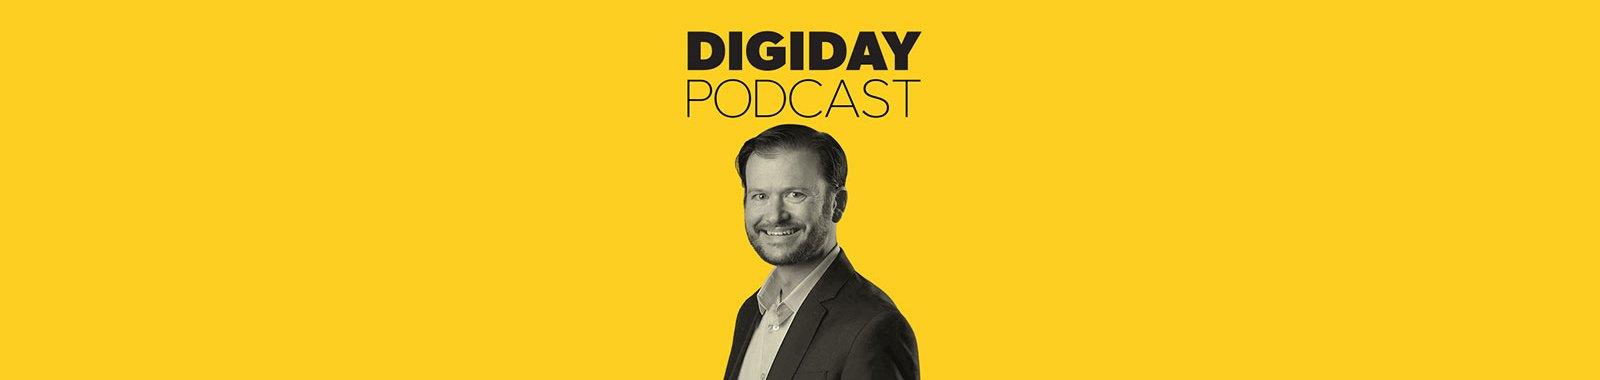 digiday-podcast_thum